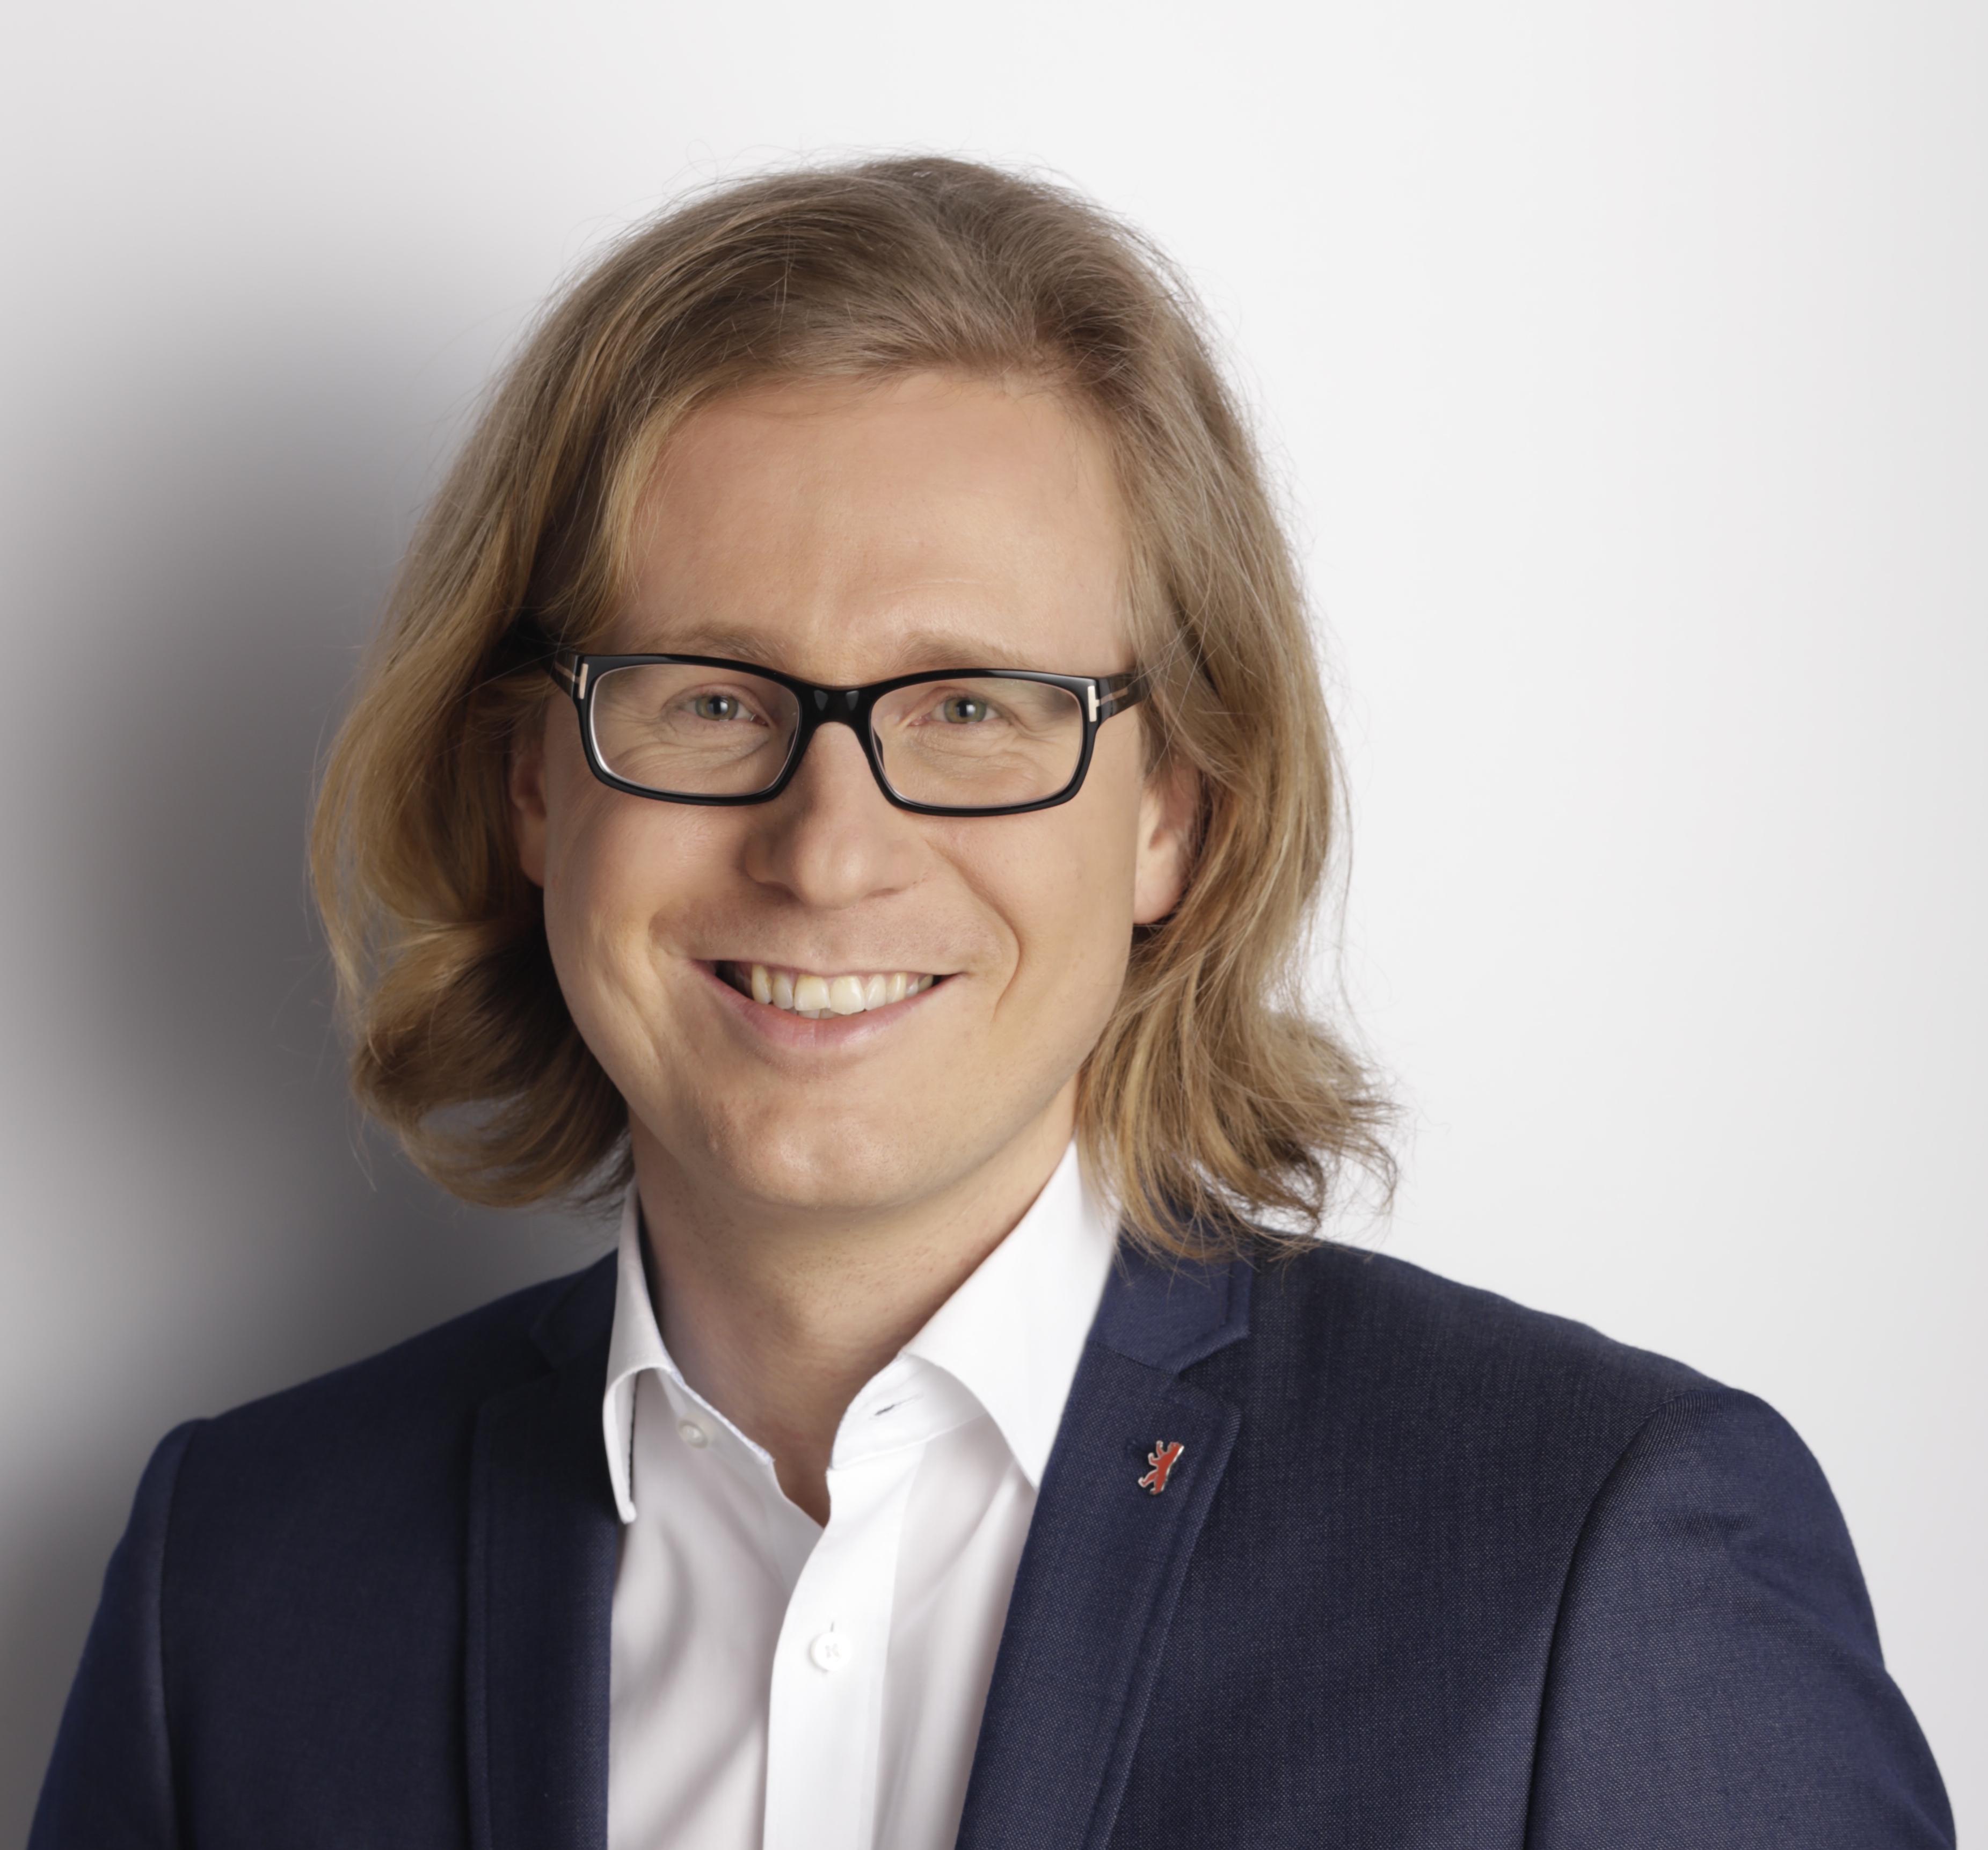 Pressefoto Kevin Hönicke